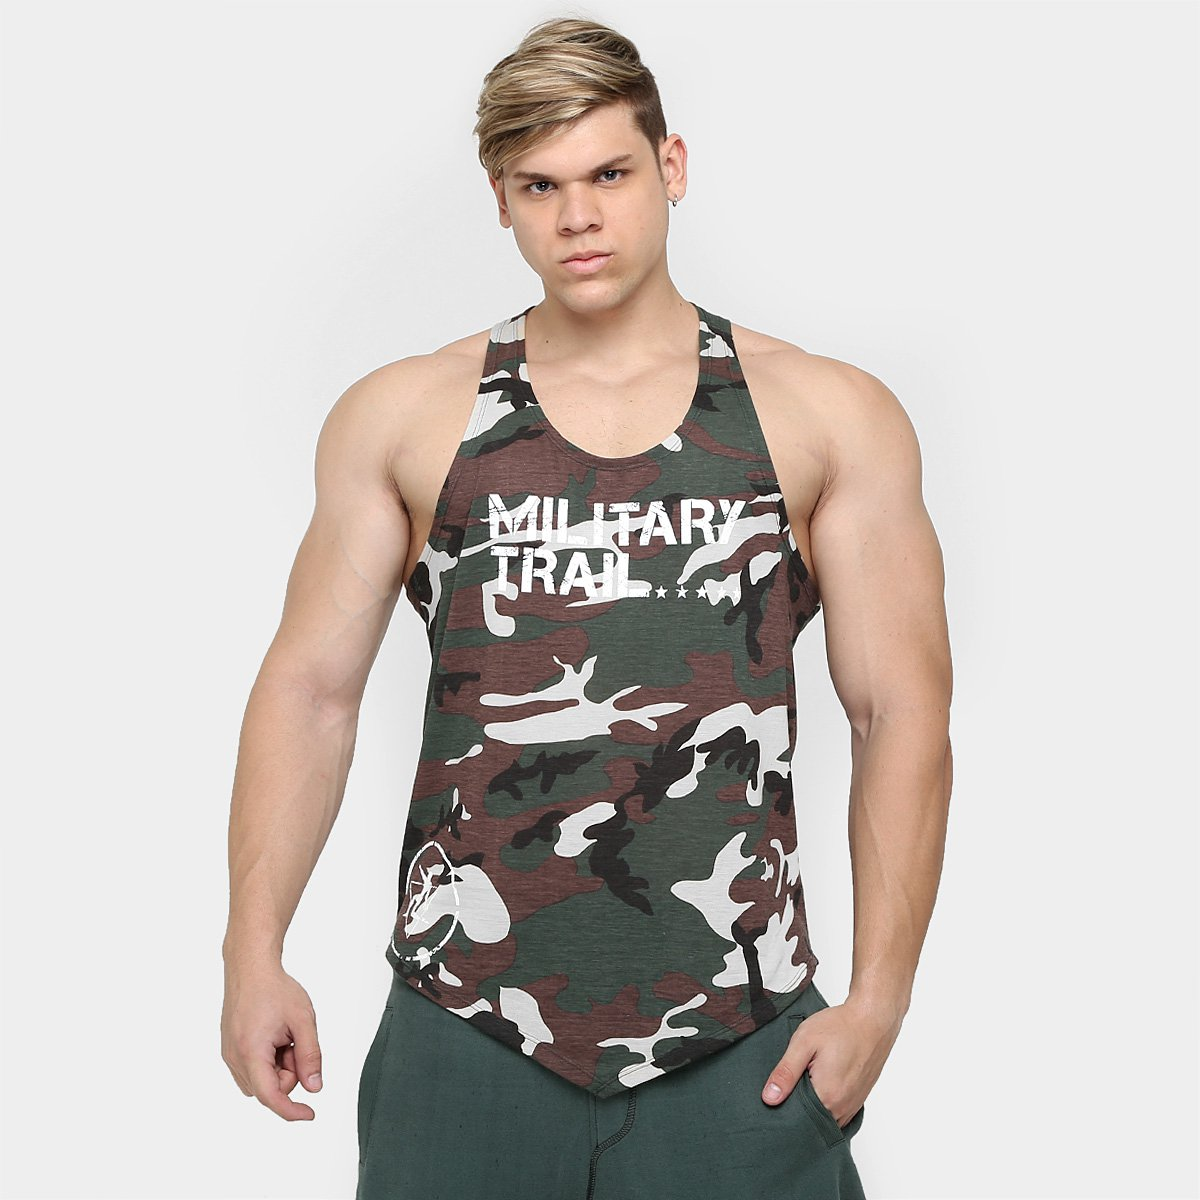 Camiseta Regata Combat Masculina Military Trail - Midway USA - Compre Agora   8a7296ca52b